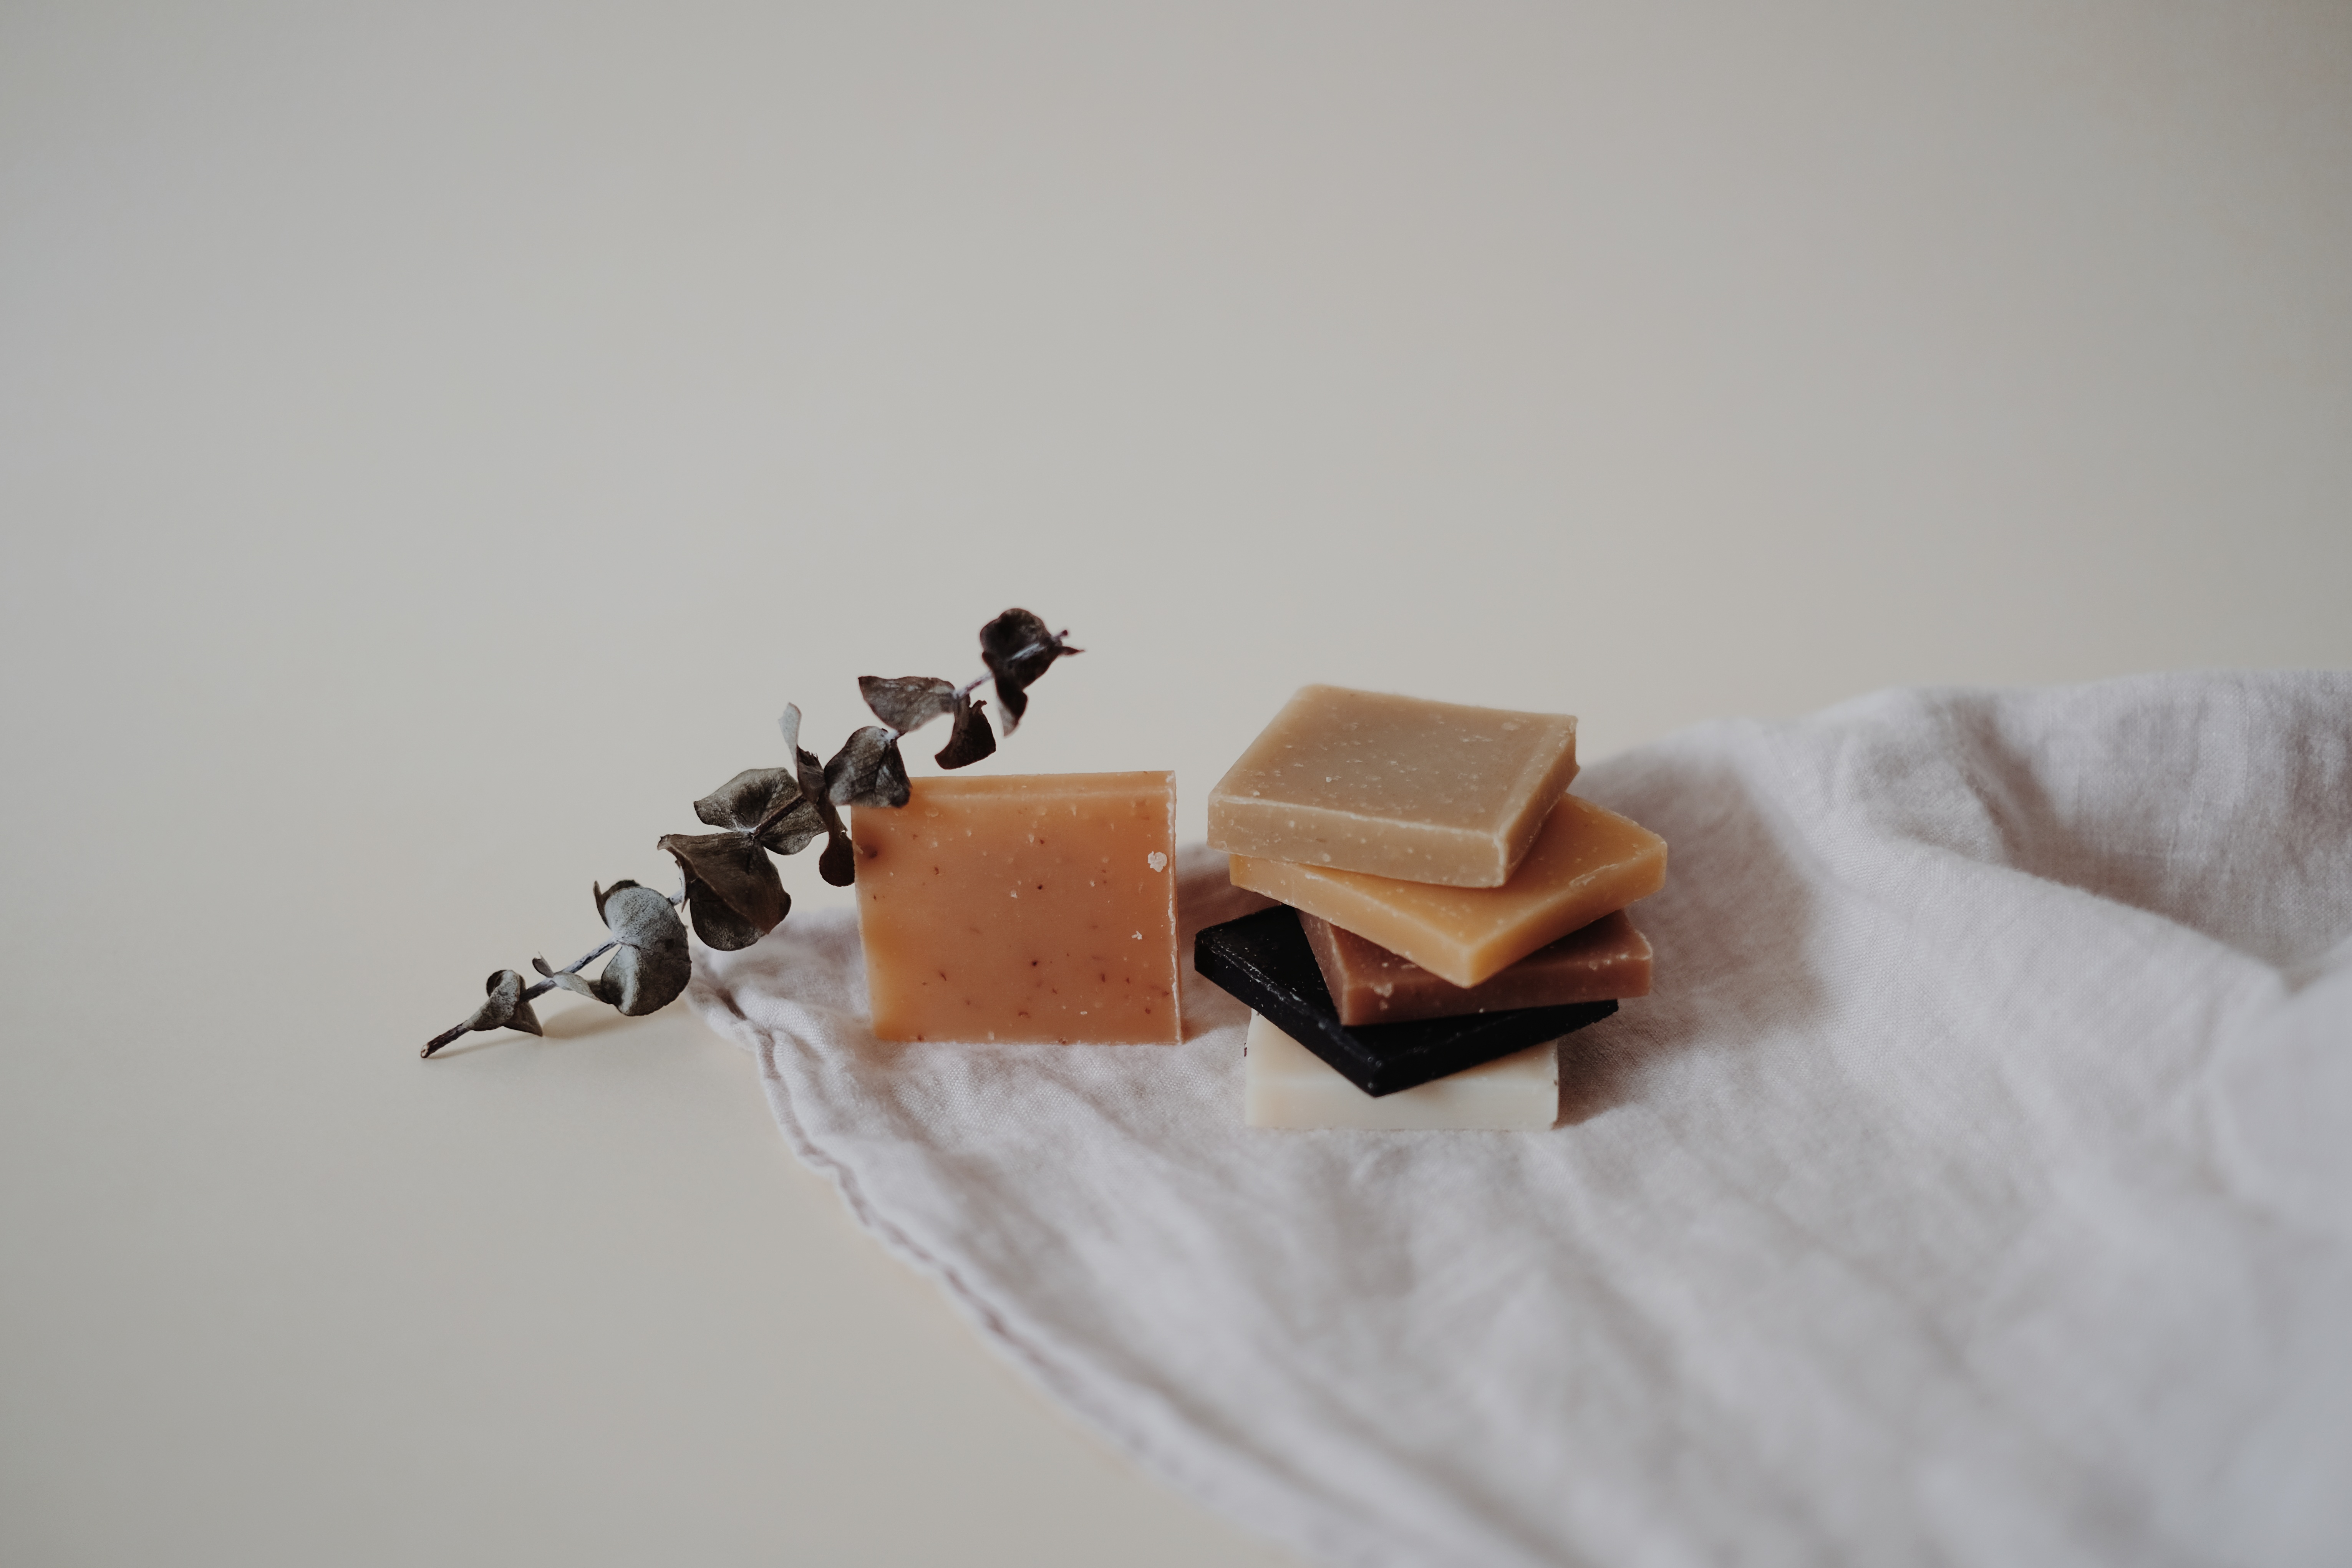 Canva - Soap or shampoo bars